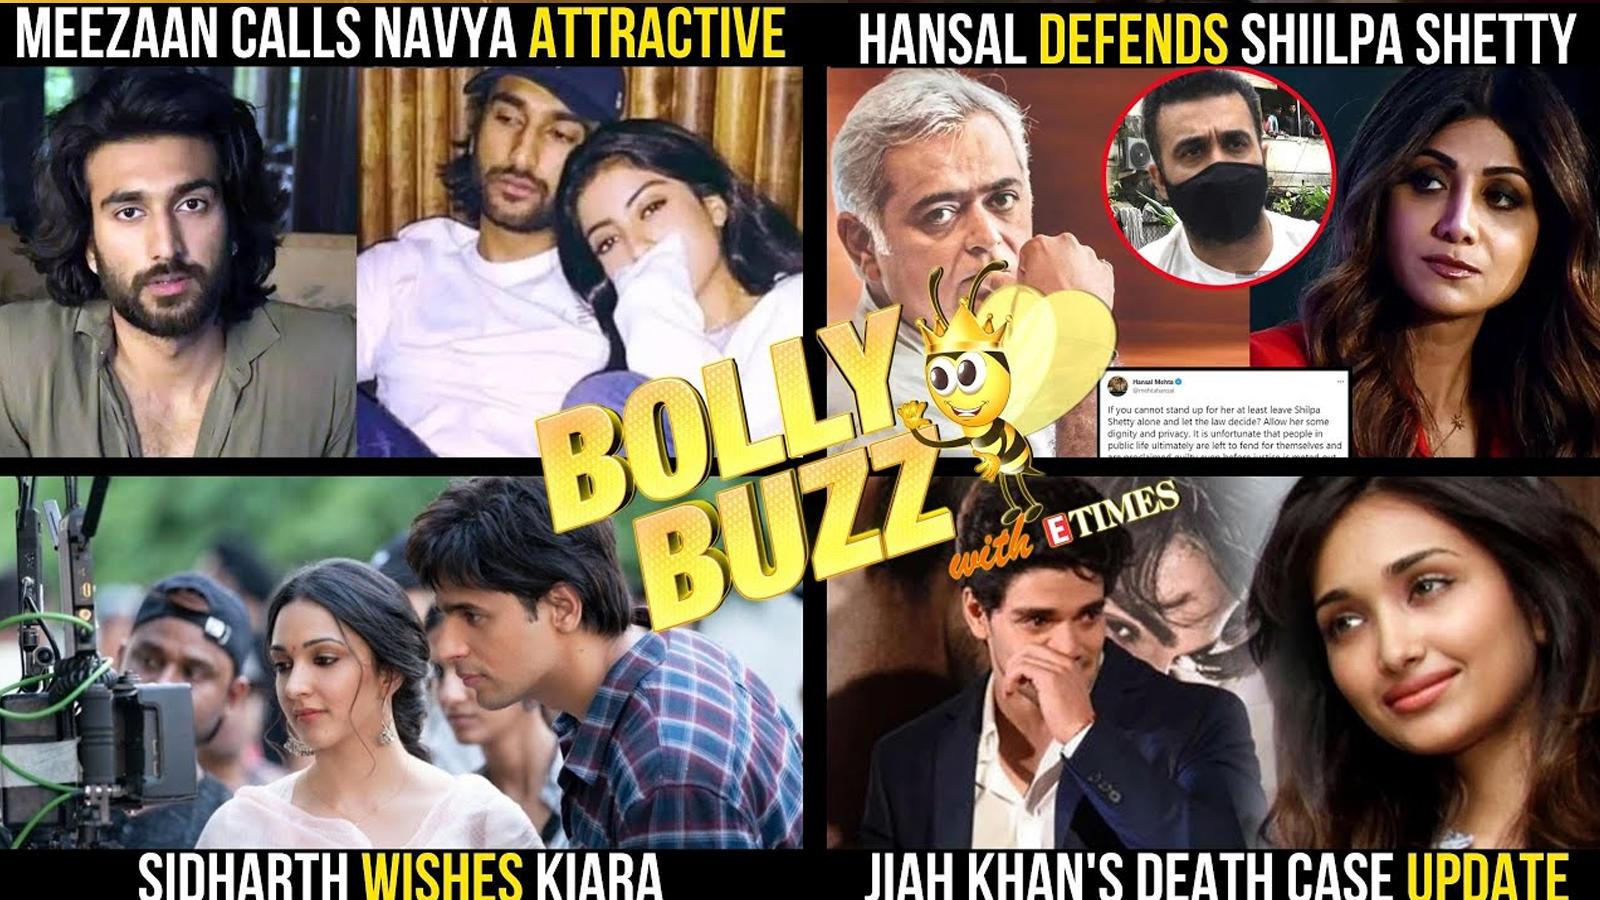 hansal-mehta-defends-shilpa-shetty-meezaan-finds-navya-attractive-sidharth-wishes-kiara